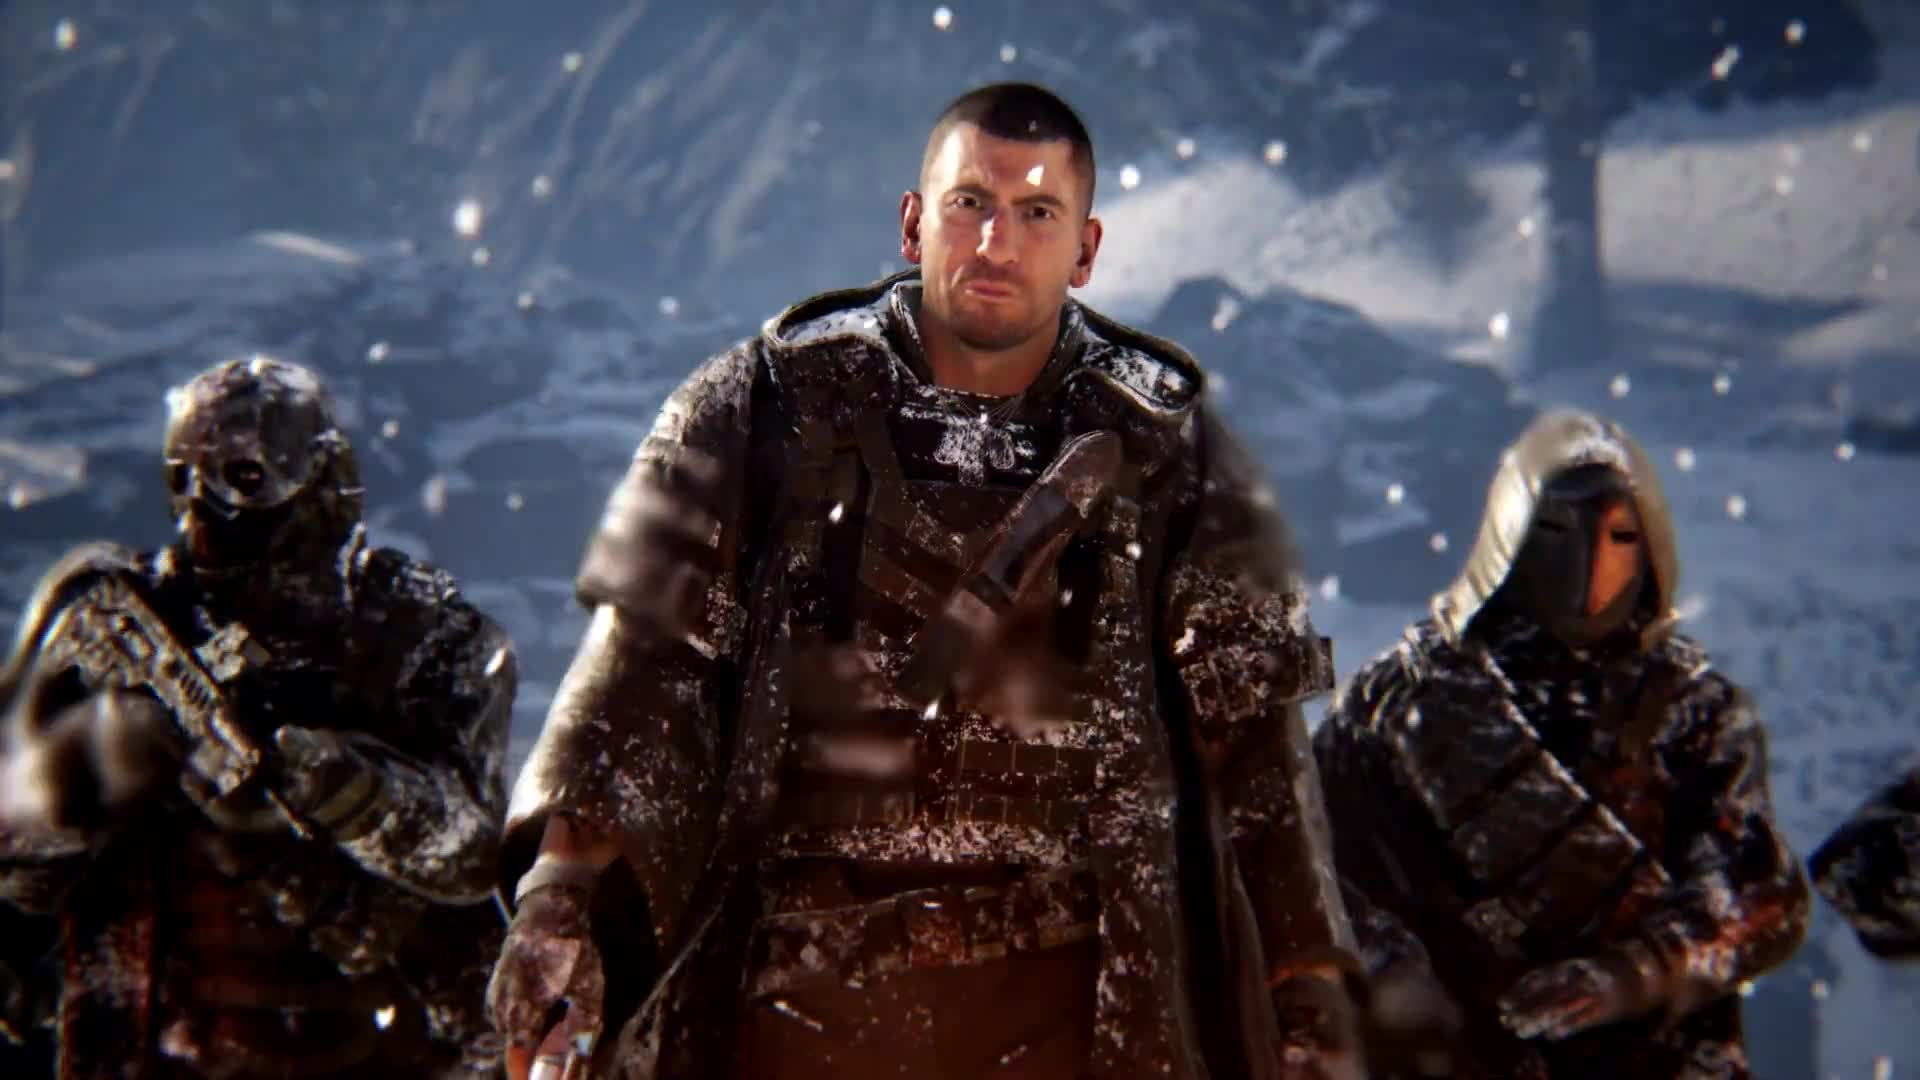 Trailer, Ubisoft, actionspiel, Tom Clancy, Ghost Recon, Ghost Recon Breakpoint